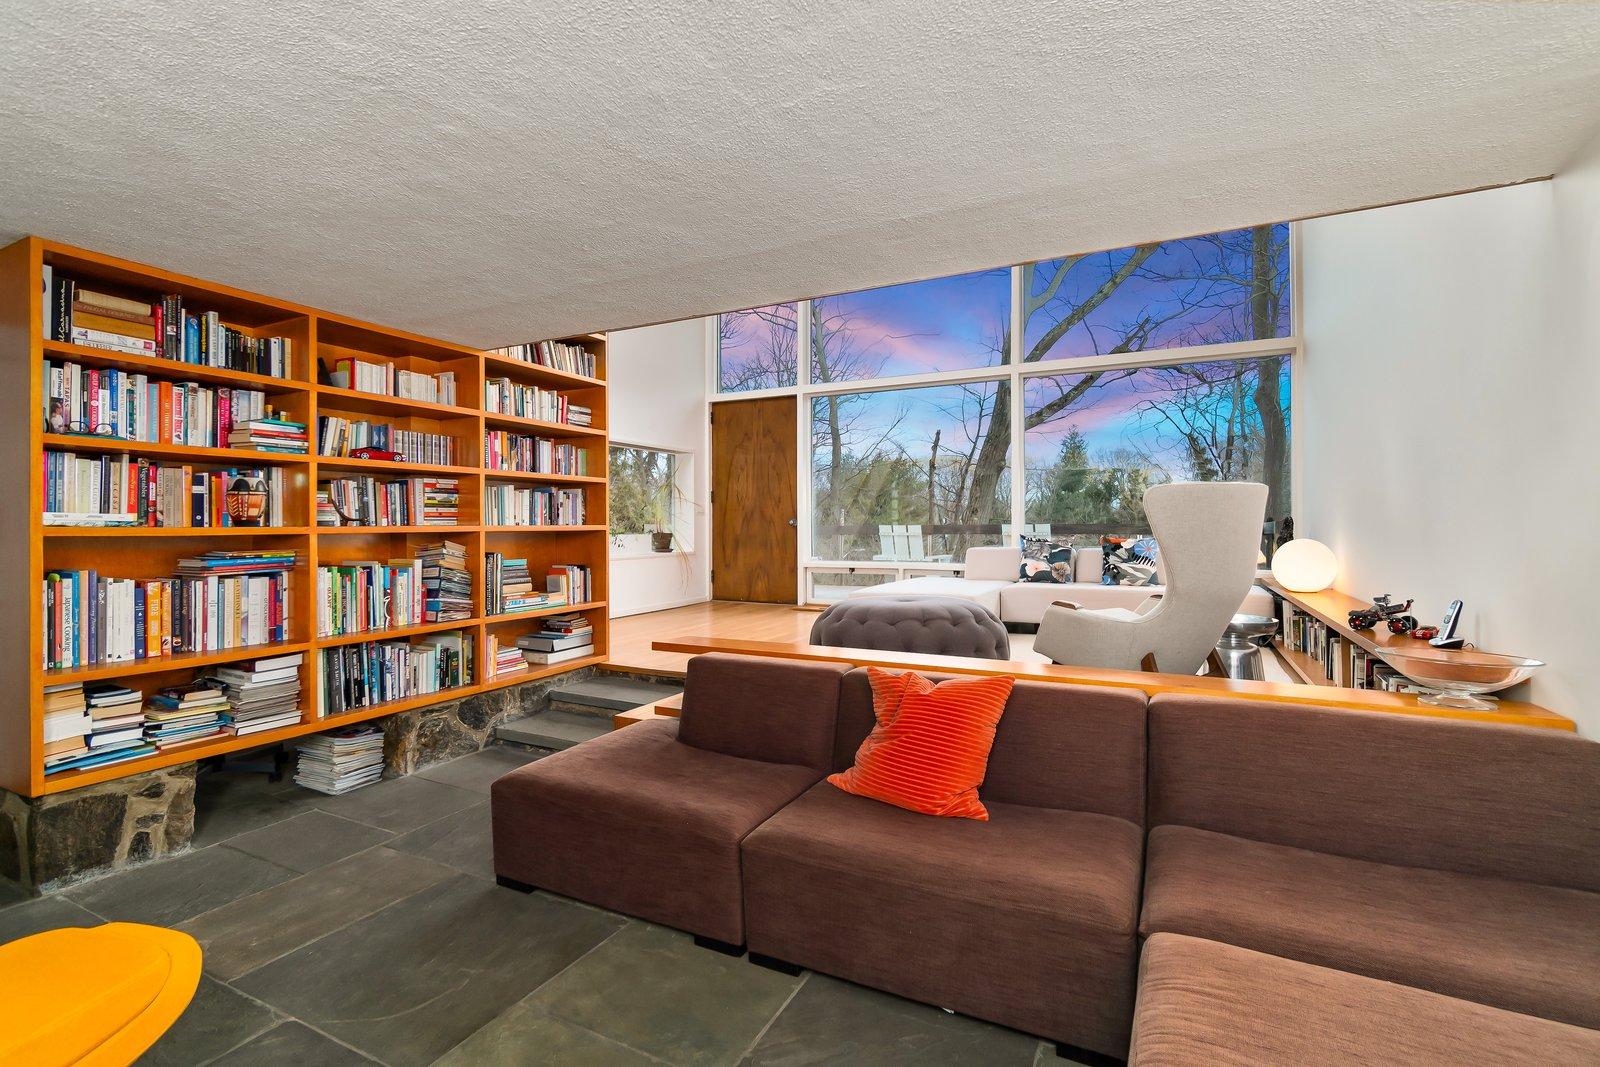 Ezra Stoller Home living area